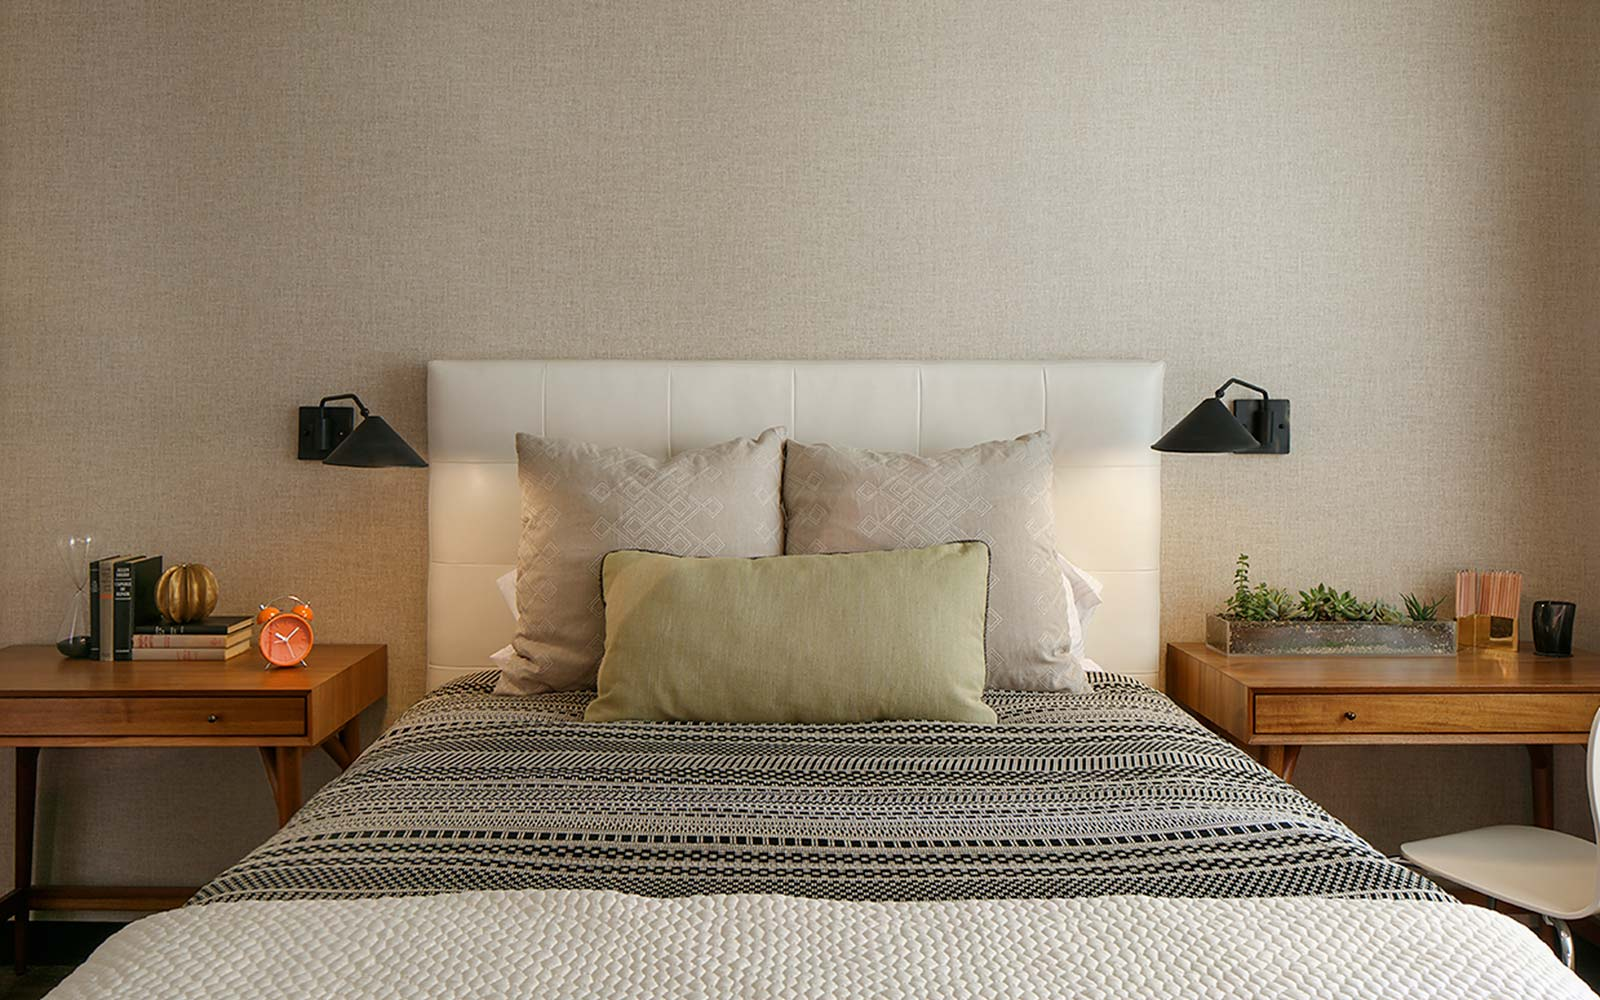 Belvedere interior designer, high net worth interior design of contemporary guest room.